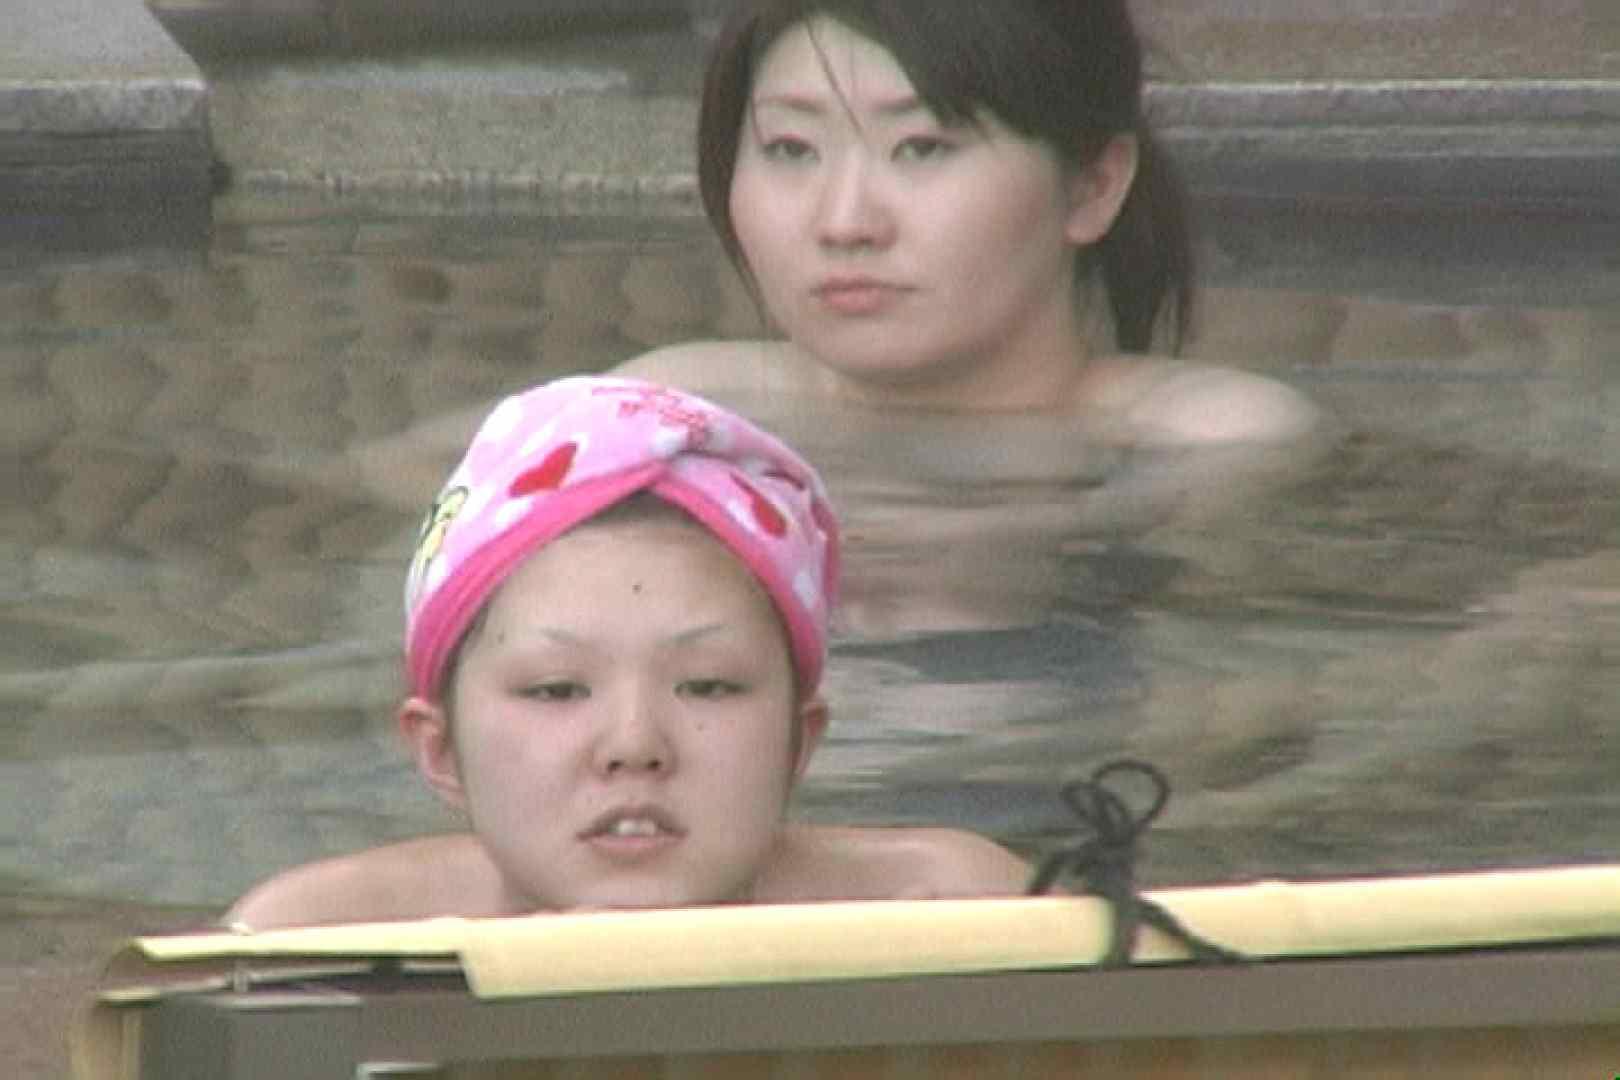 Aquaな露天風呂Vol.25 0 | 0  47連発 33